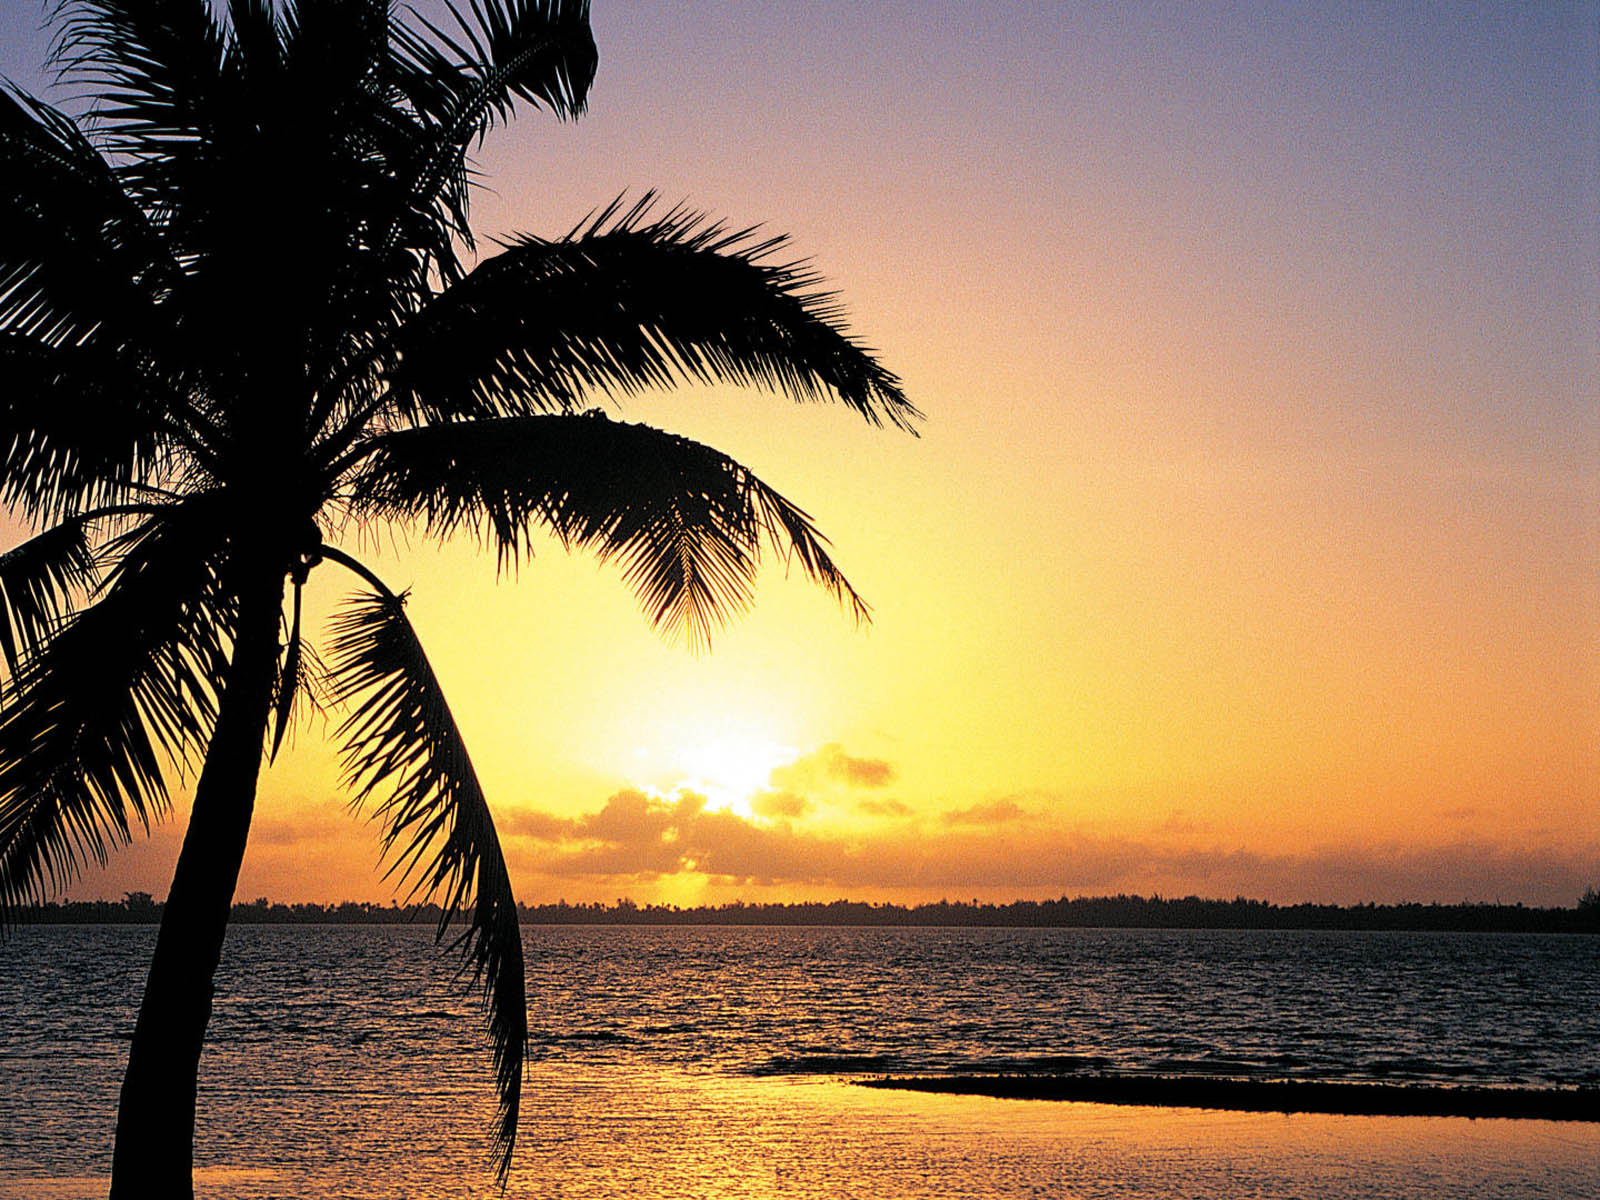 the Island Sunset Wallpapers Island Sunset Desktop Wallpapers Island 1600x1200